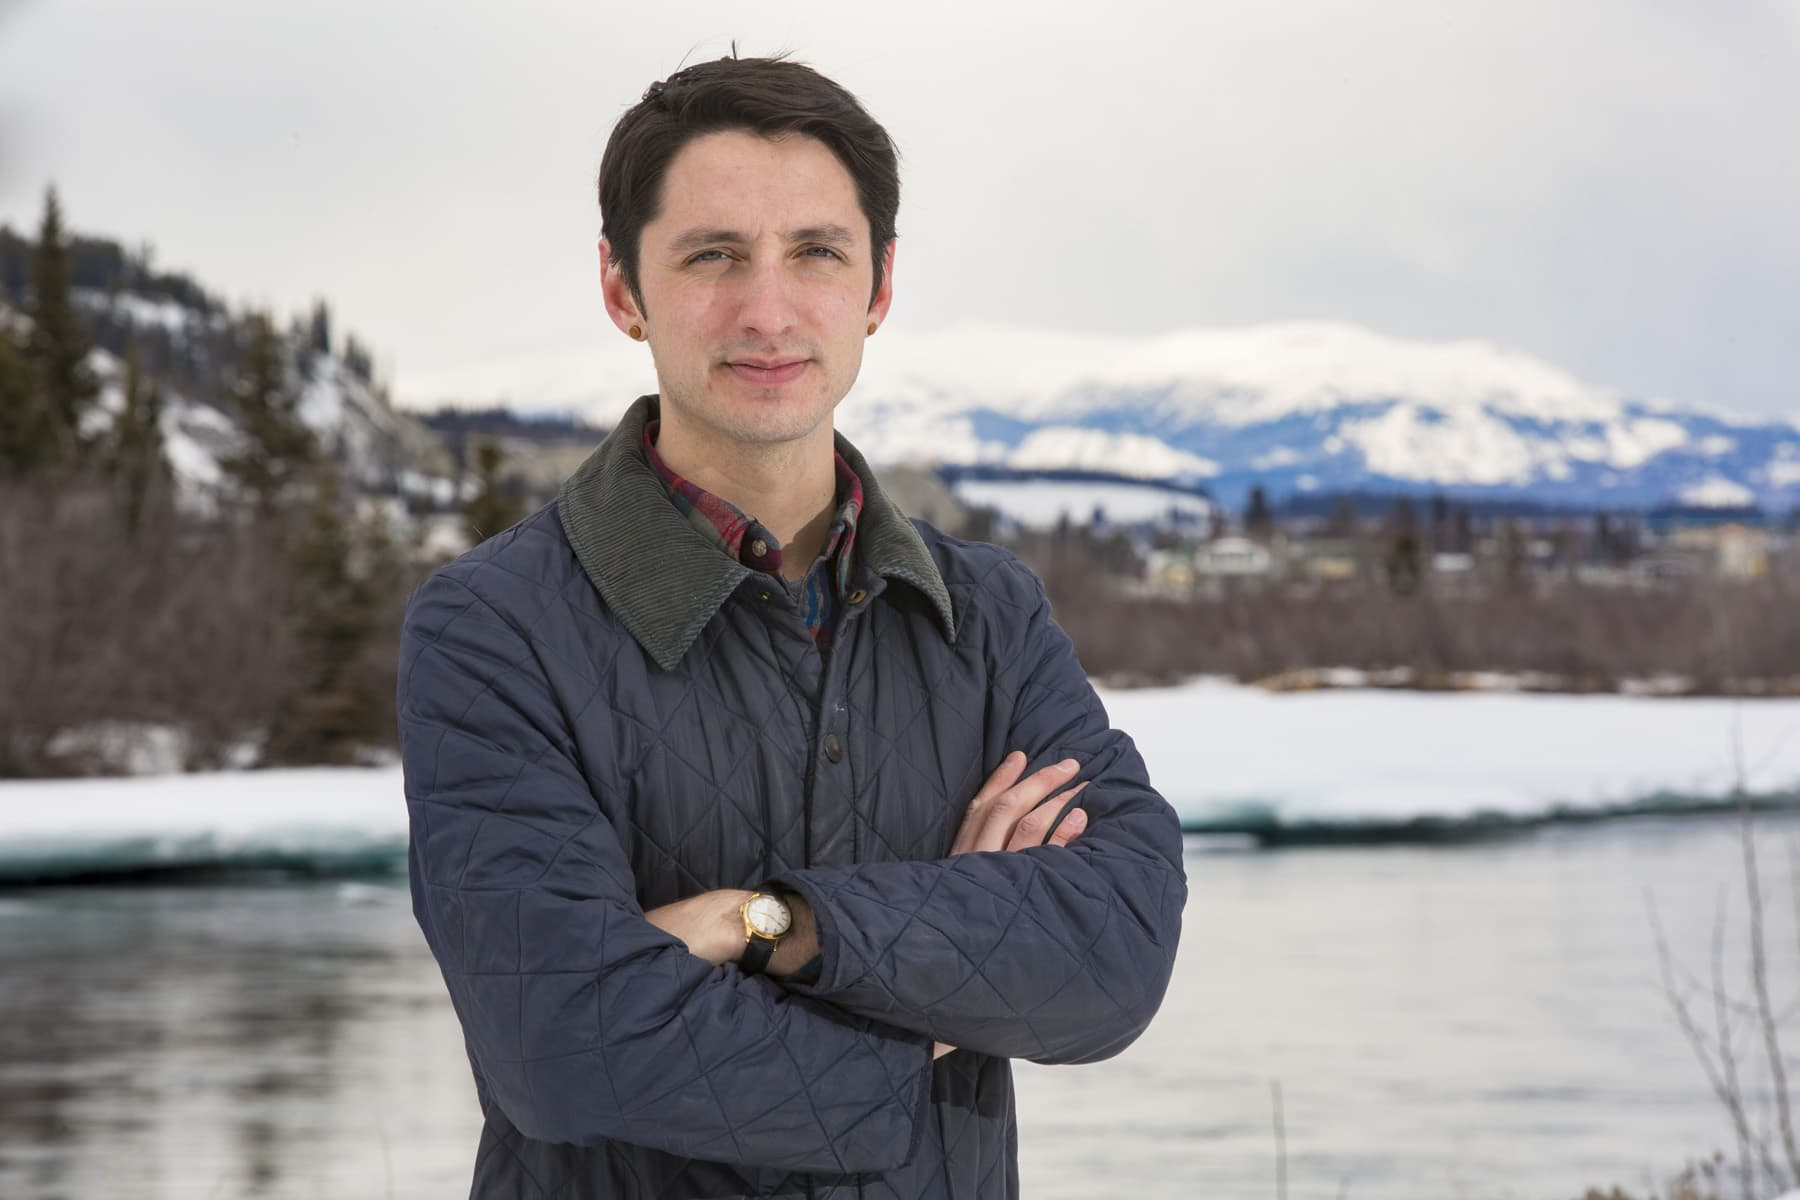 Julien Gignac portrait, The Narwhal, Yukon